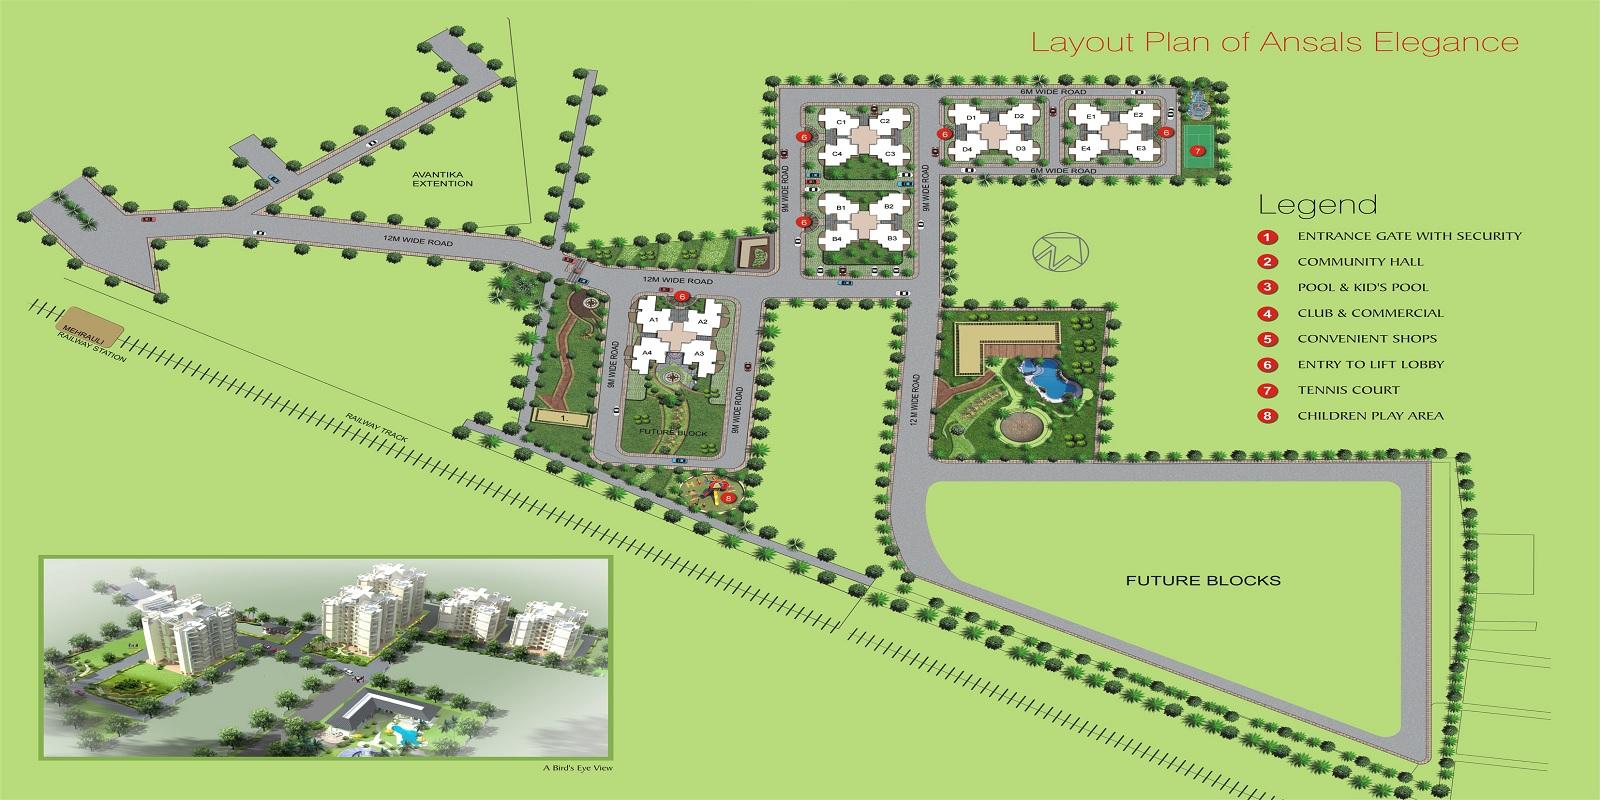 ansal housing elegance project master plan image1